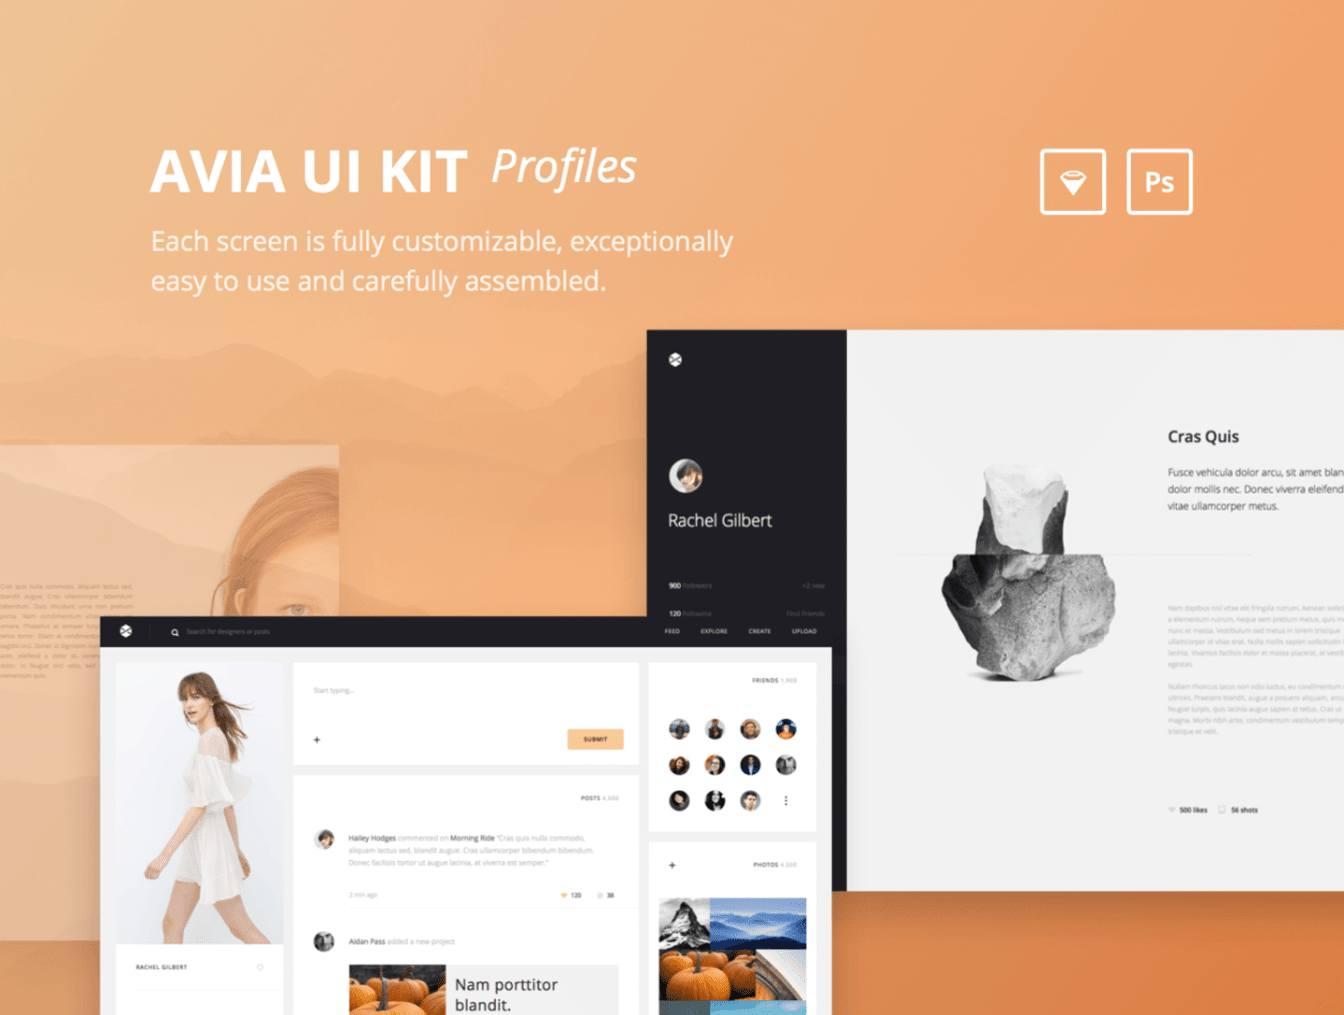 Avia UI Kit - 40 Sketch Template Profile Kit